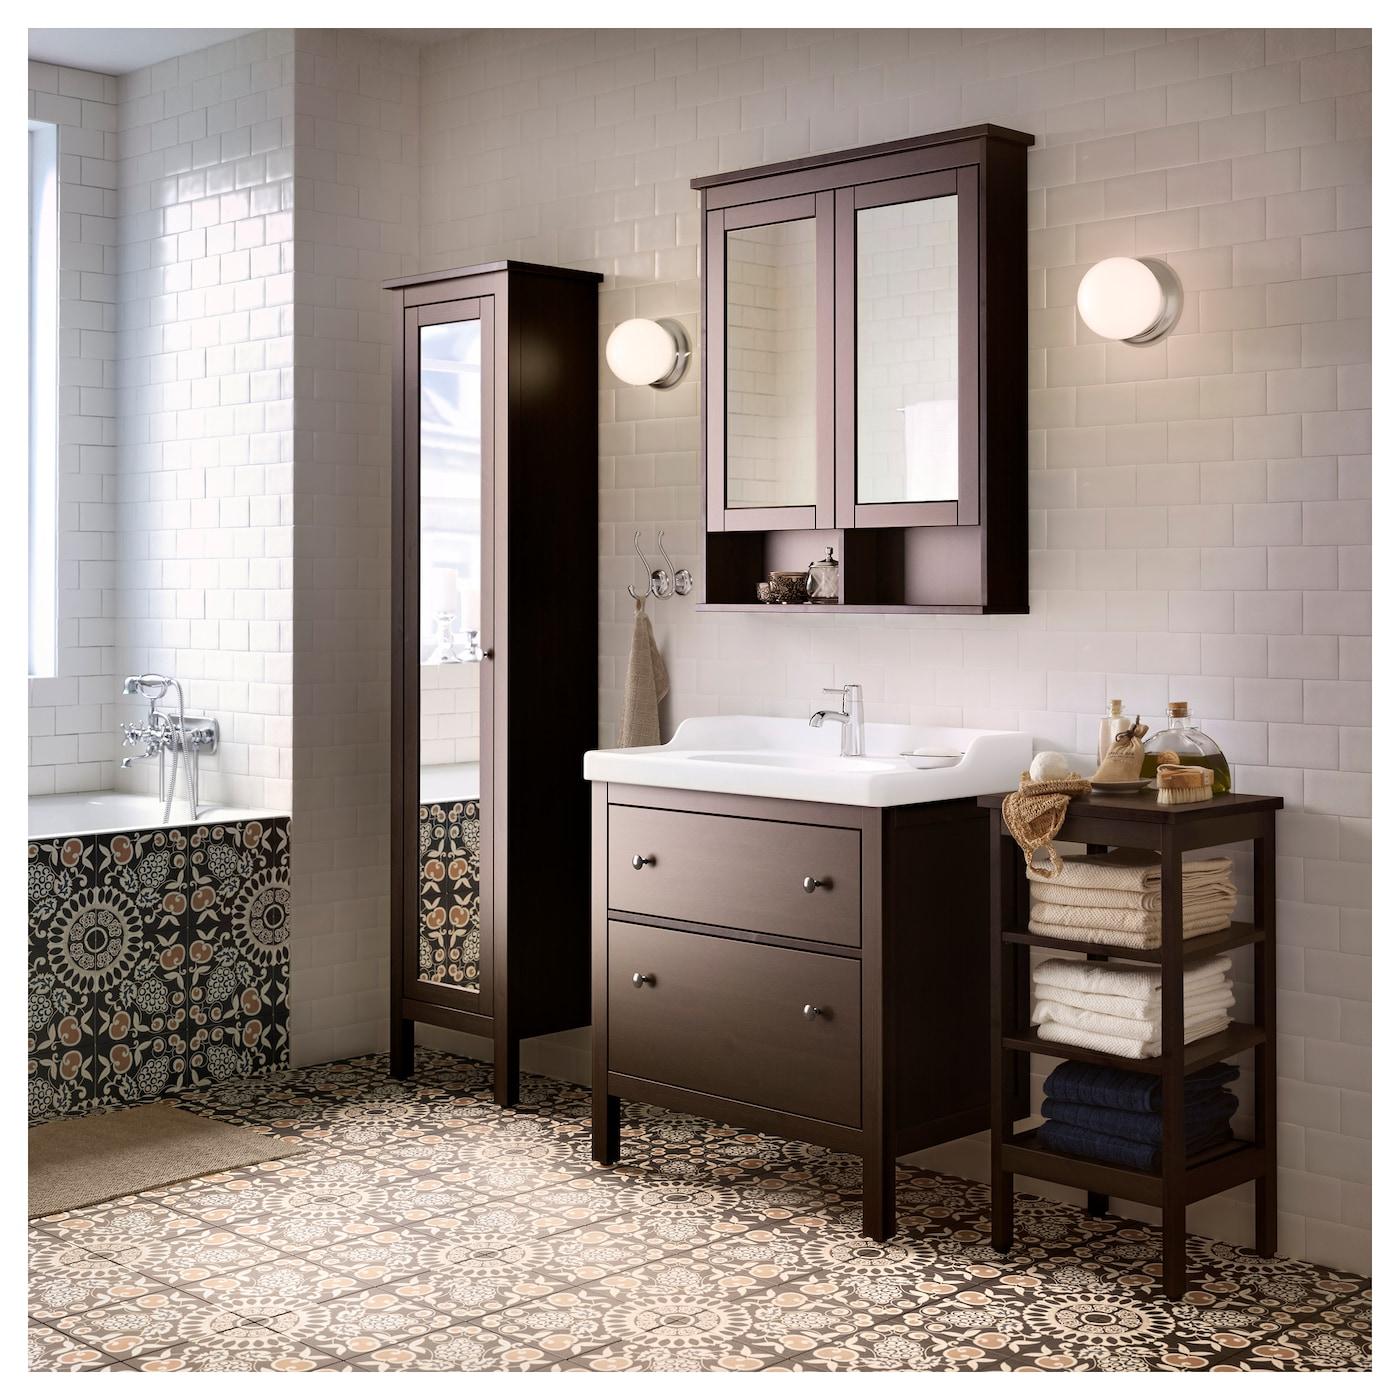 lillholmen ceiling wall lamp nickel plated white ikea. Black Bedroom Furniture Sets. Home Design Ideas